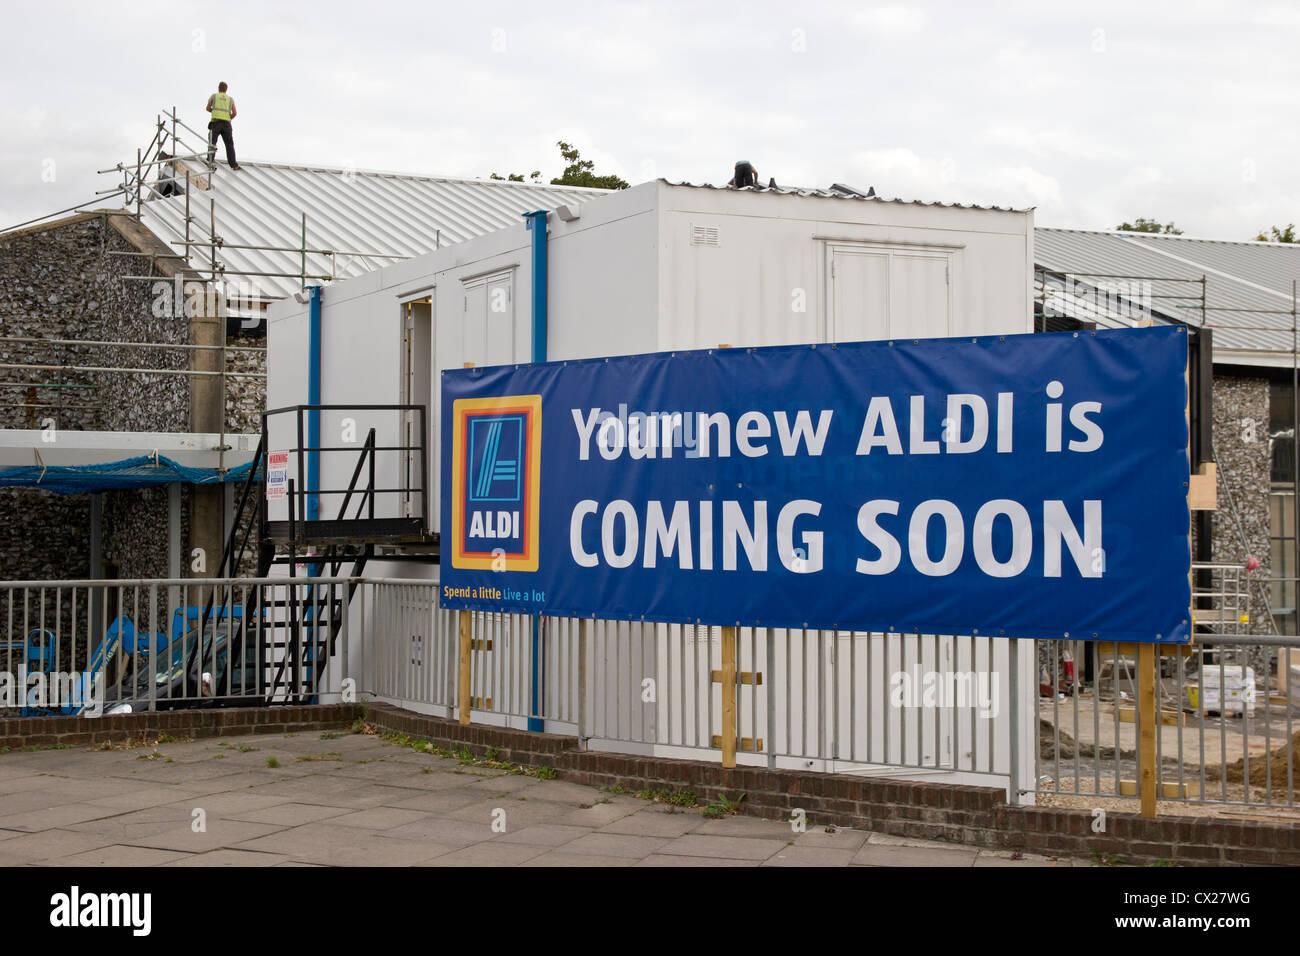 Aldi New Store Opening Soon Stock Photo: 50451900 - Alamy